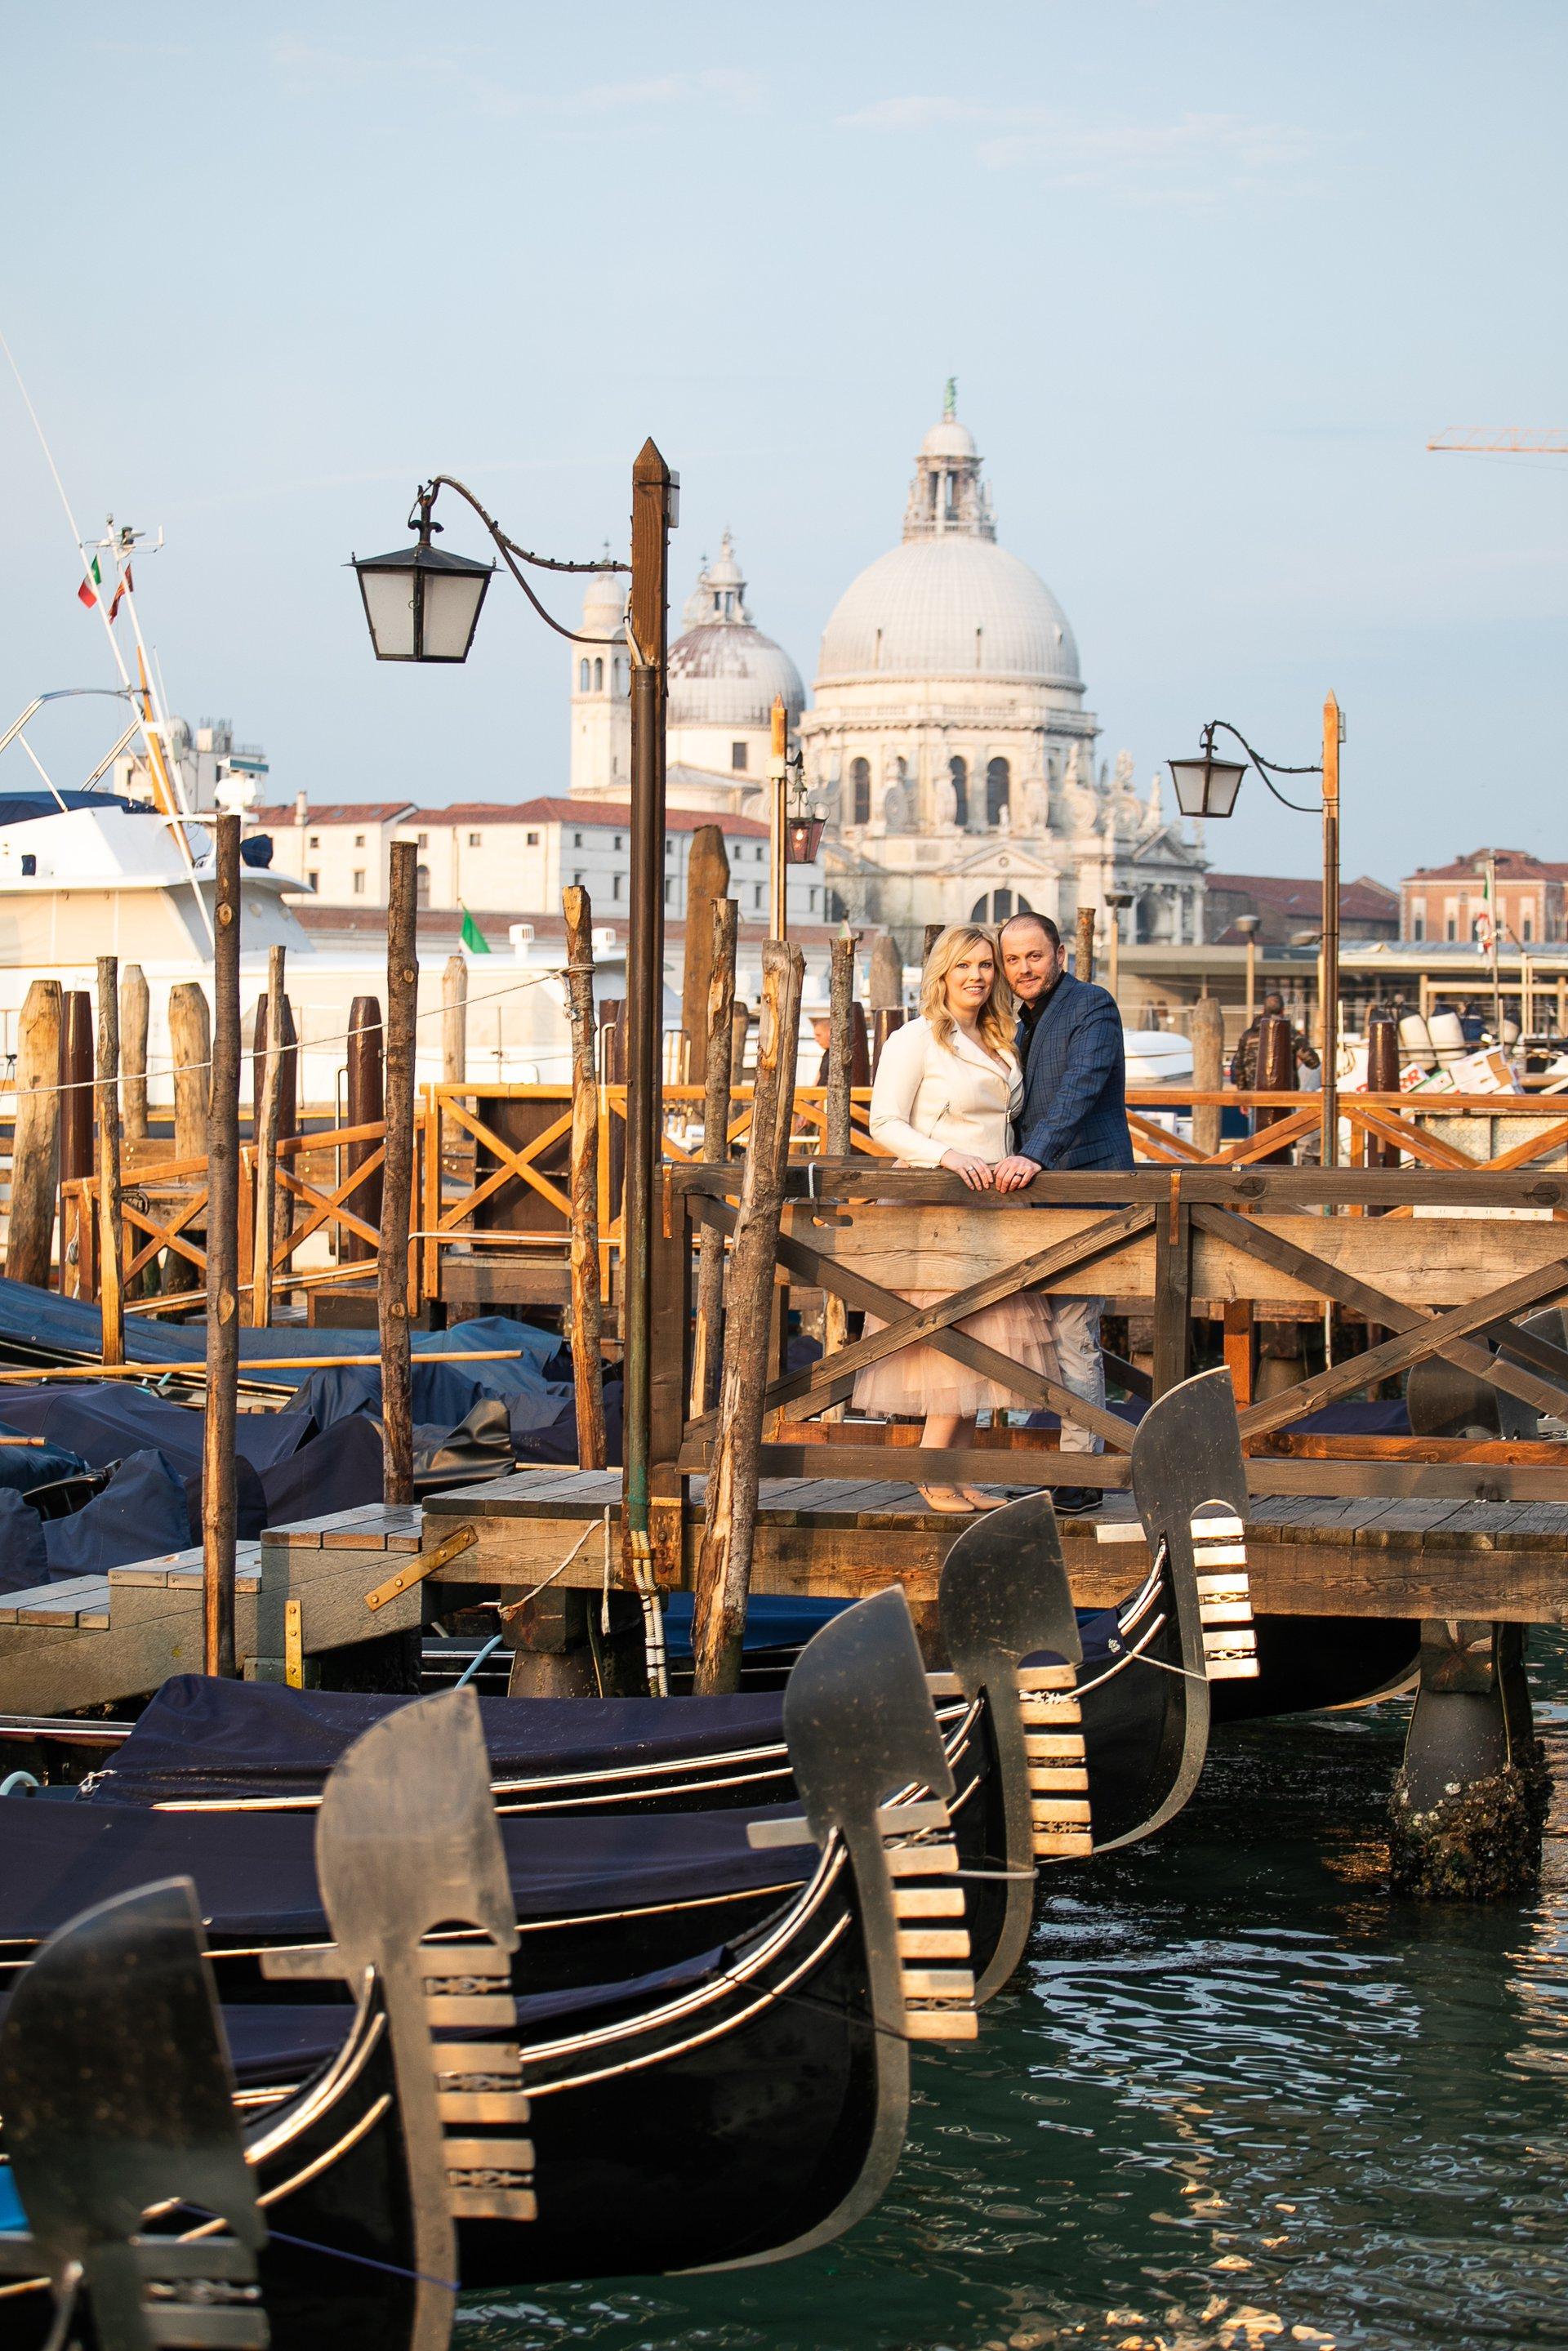 Venice-Italy-travel-story-Flytographer-23